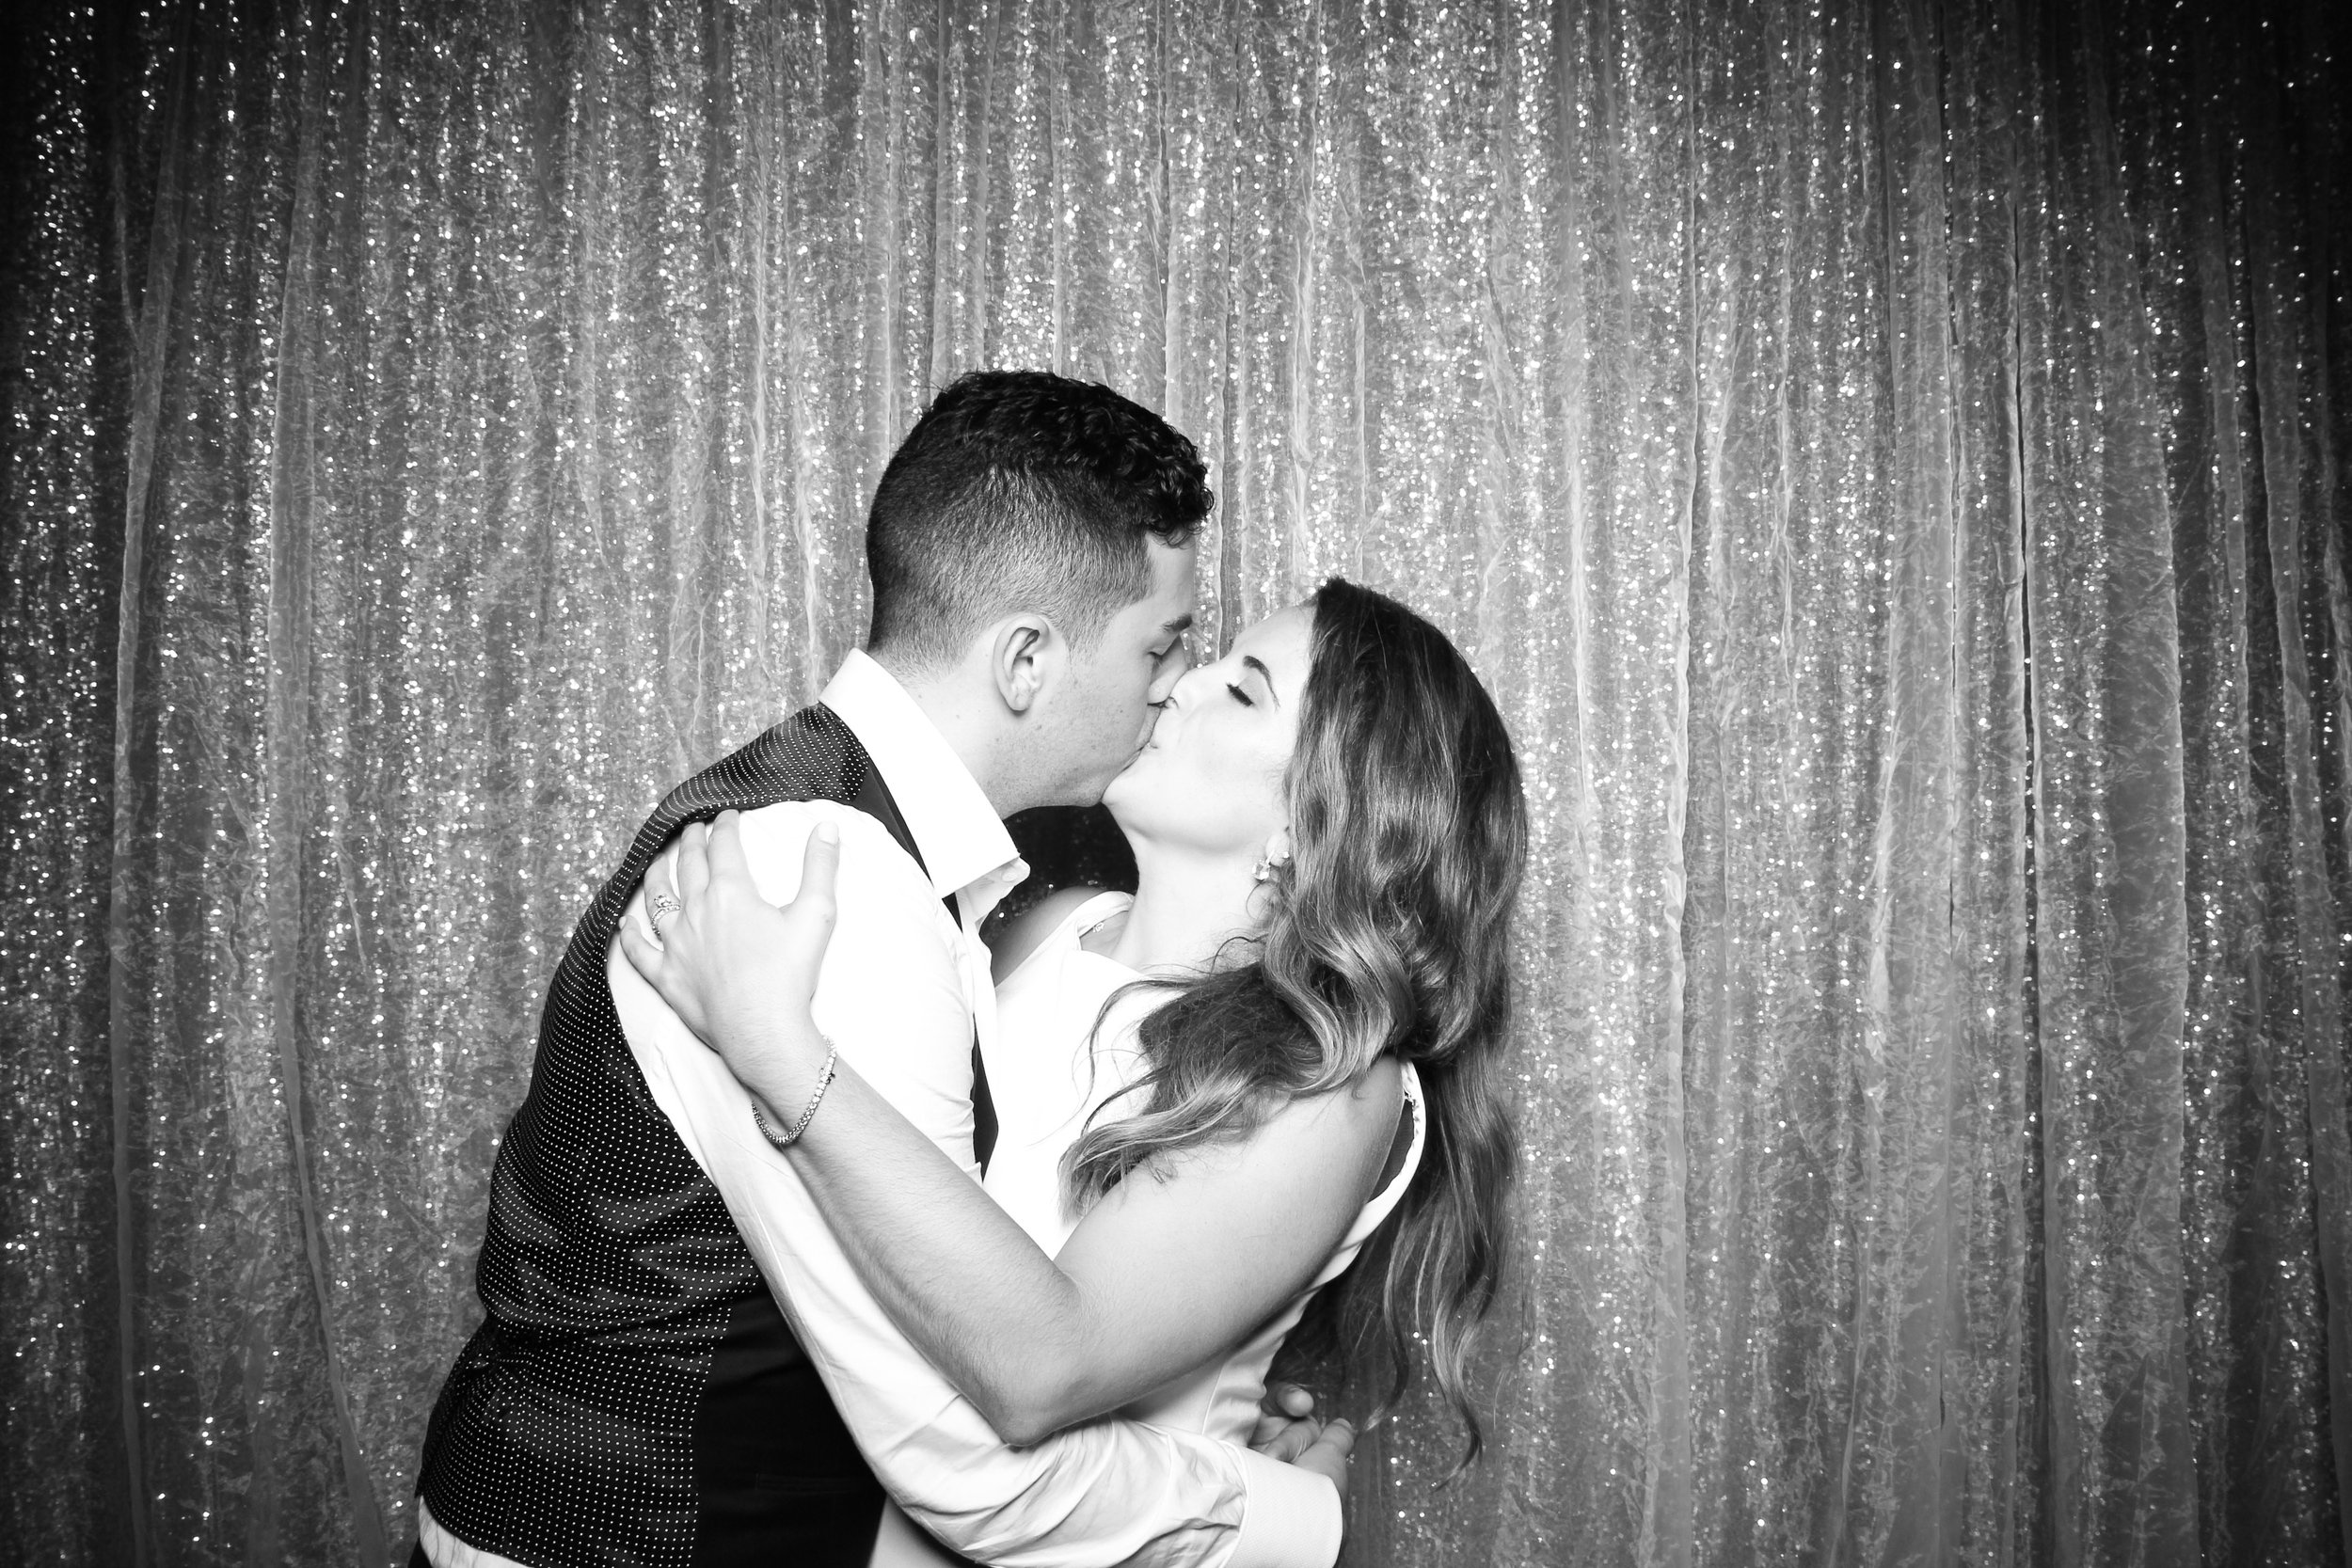 JW_Marriott_Burnham_Ballroom_Wedding_Photo_Booth_16.jpg